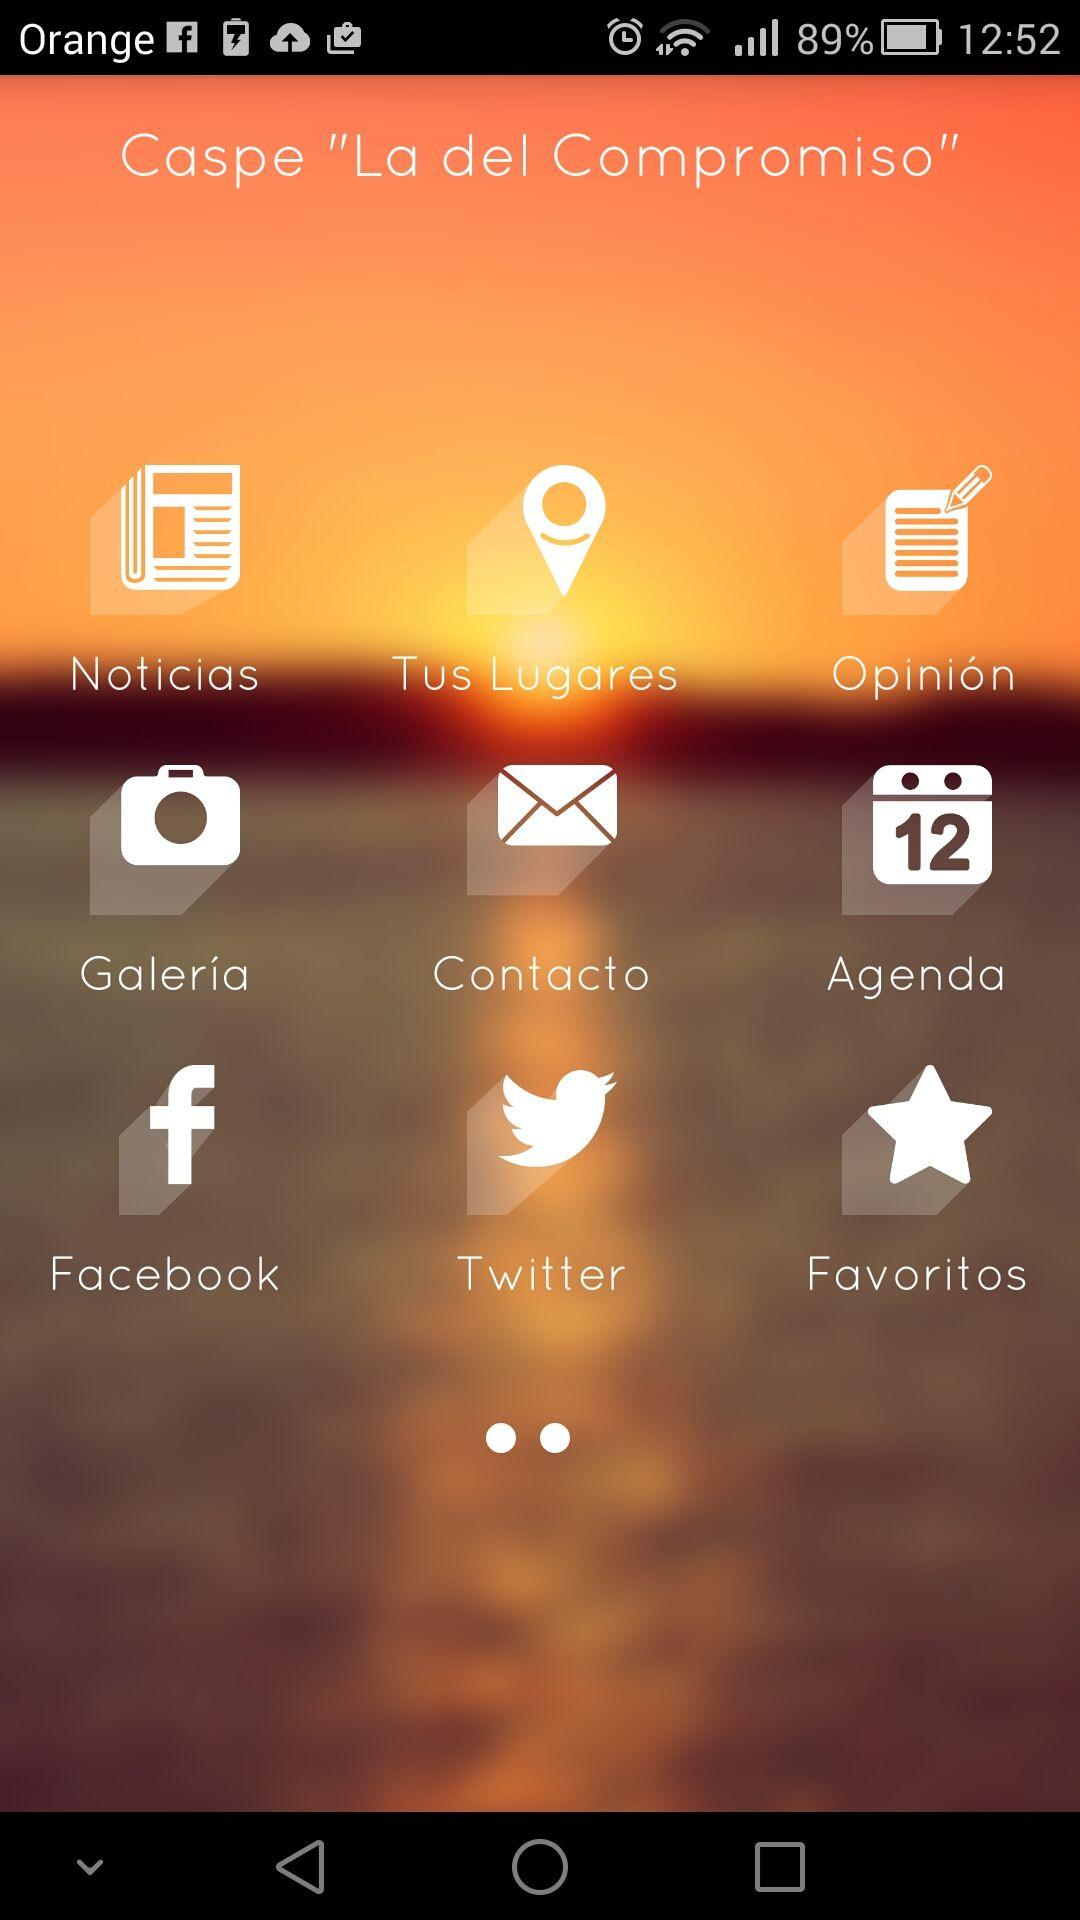 pantallazo_app_caspe_entu_bolsillo_02